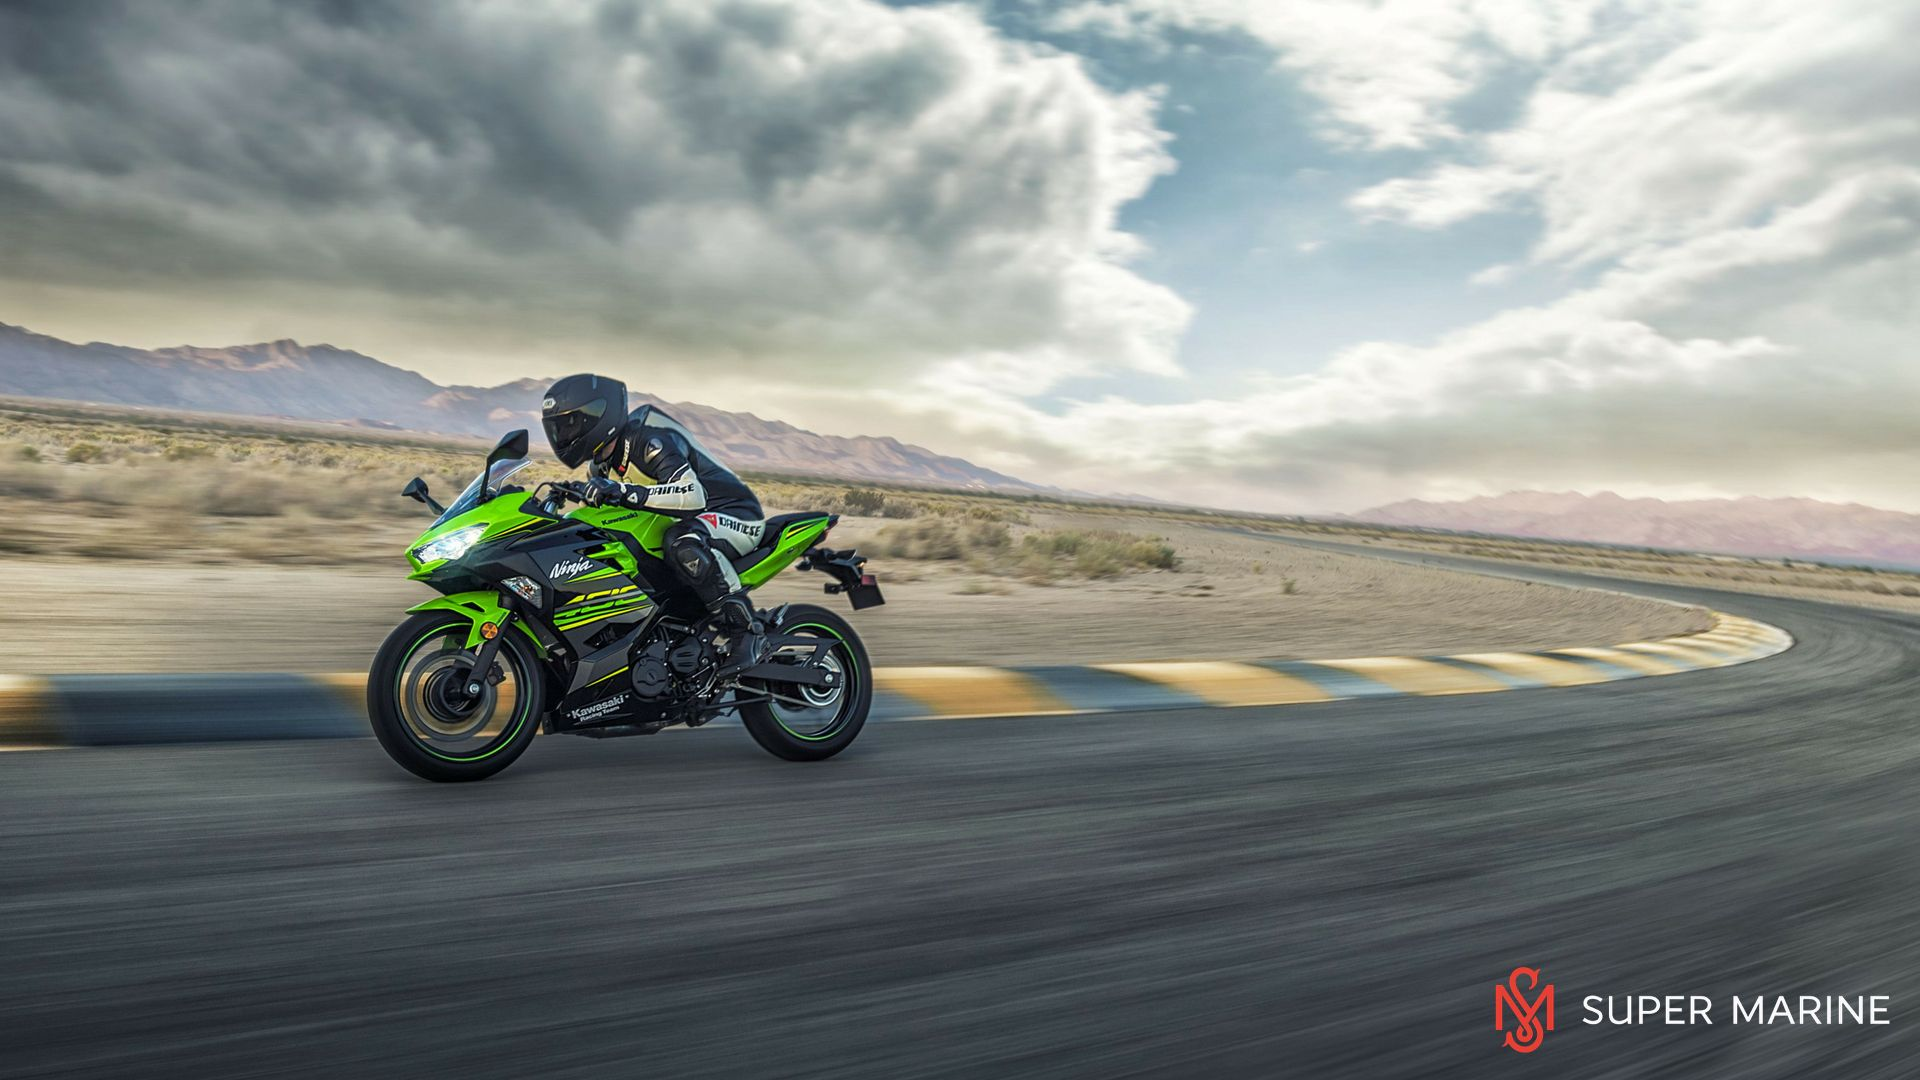 Мотоцикл Kawasaki Ninja 400 Зеленый 2020 - 12